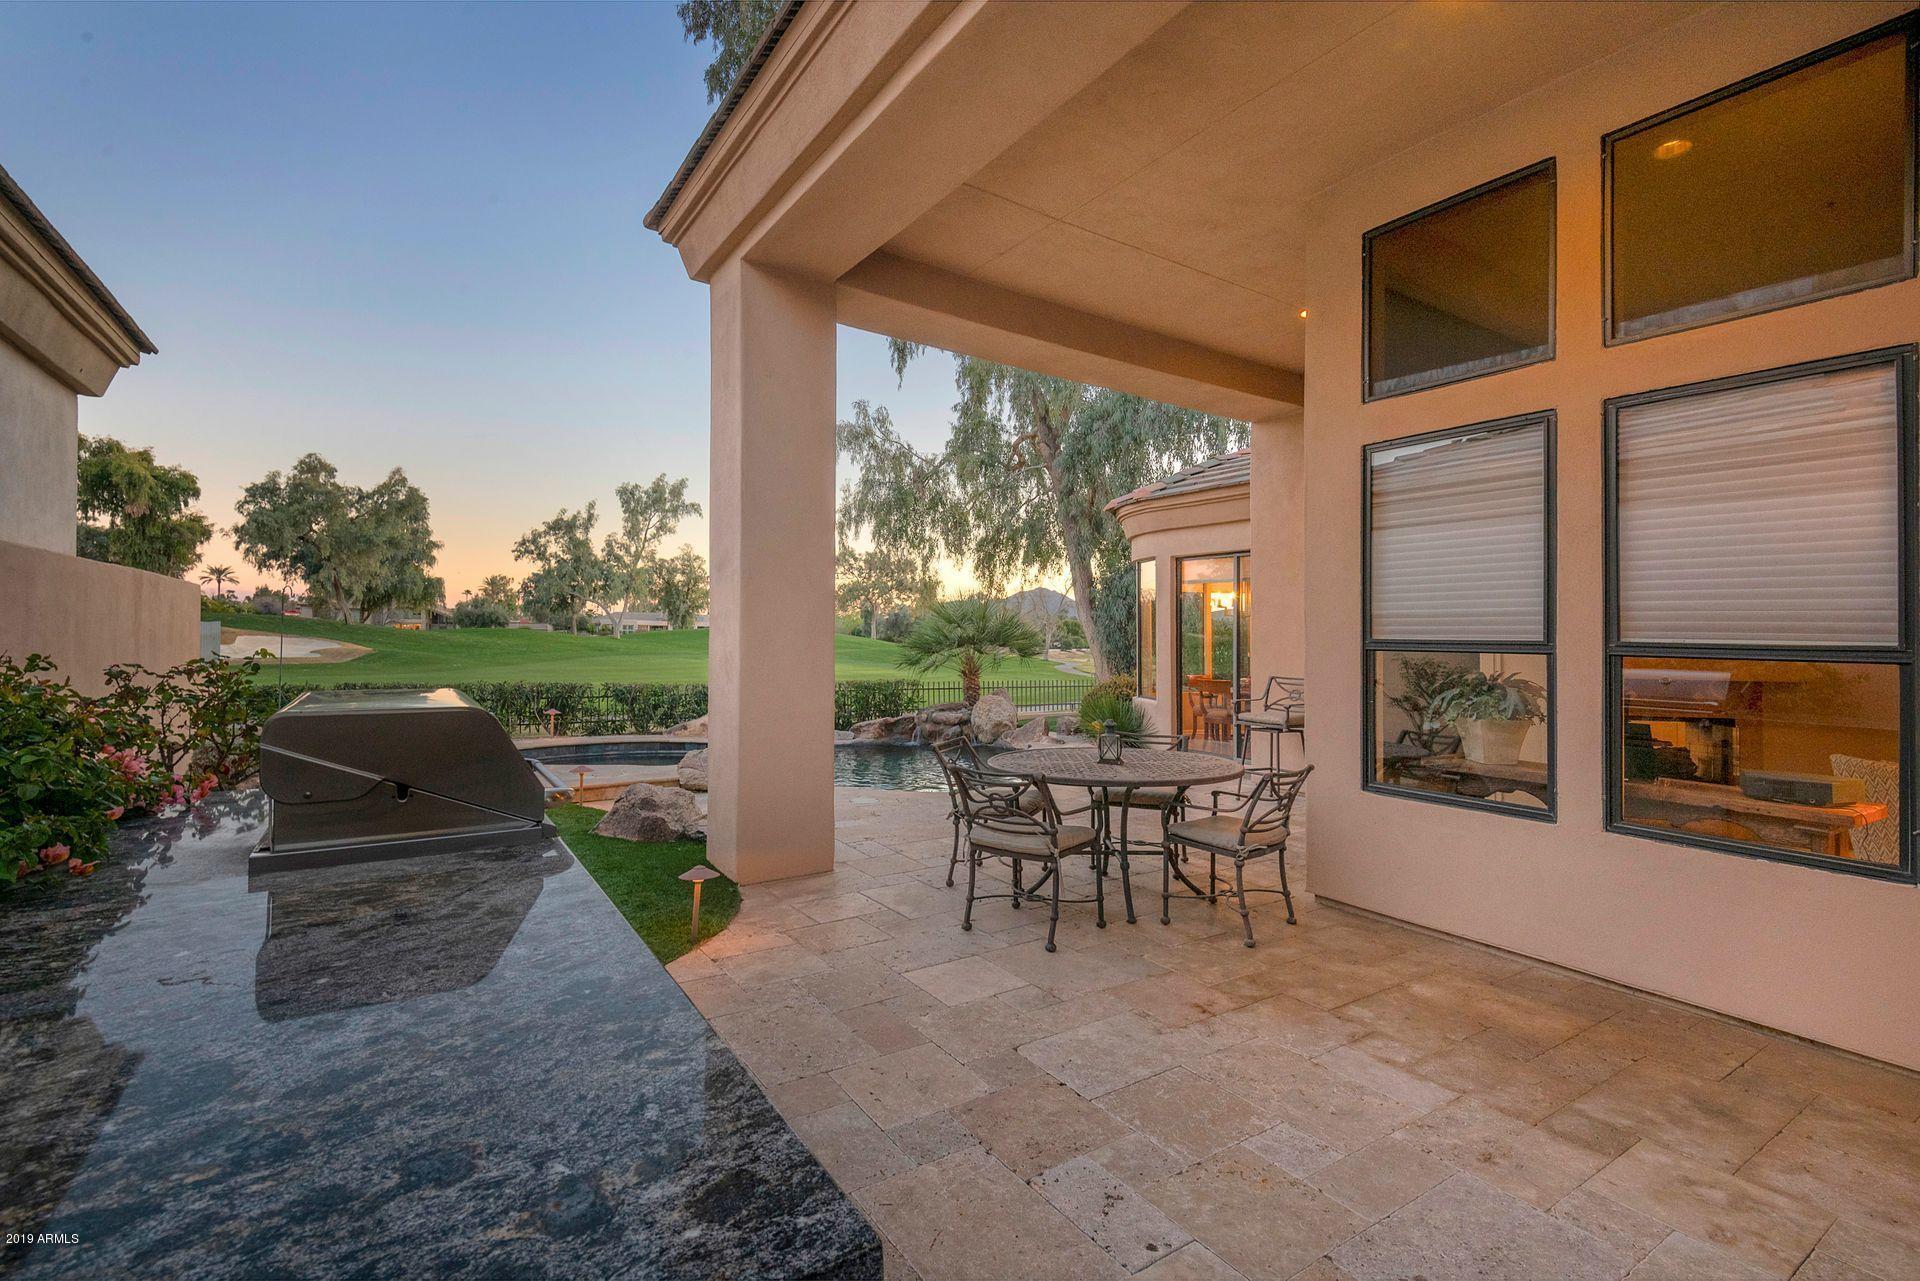 MLS 5898968 7705 E DOUBLETREE RANCH Road Unit 8, Scottsdale, AZ 85258 Scottsdale AZ Gainey Ranch